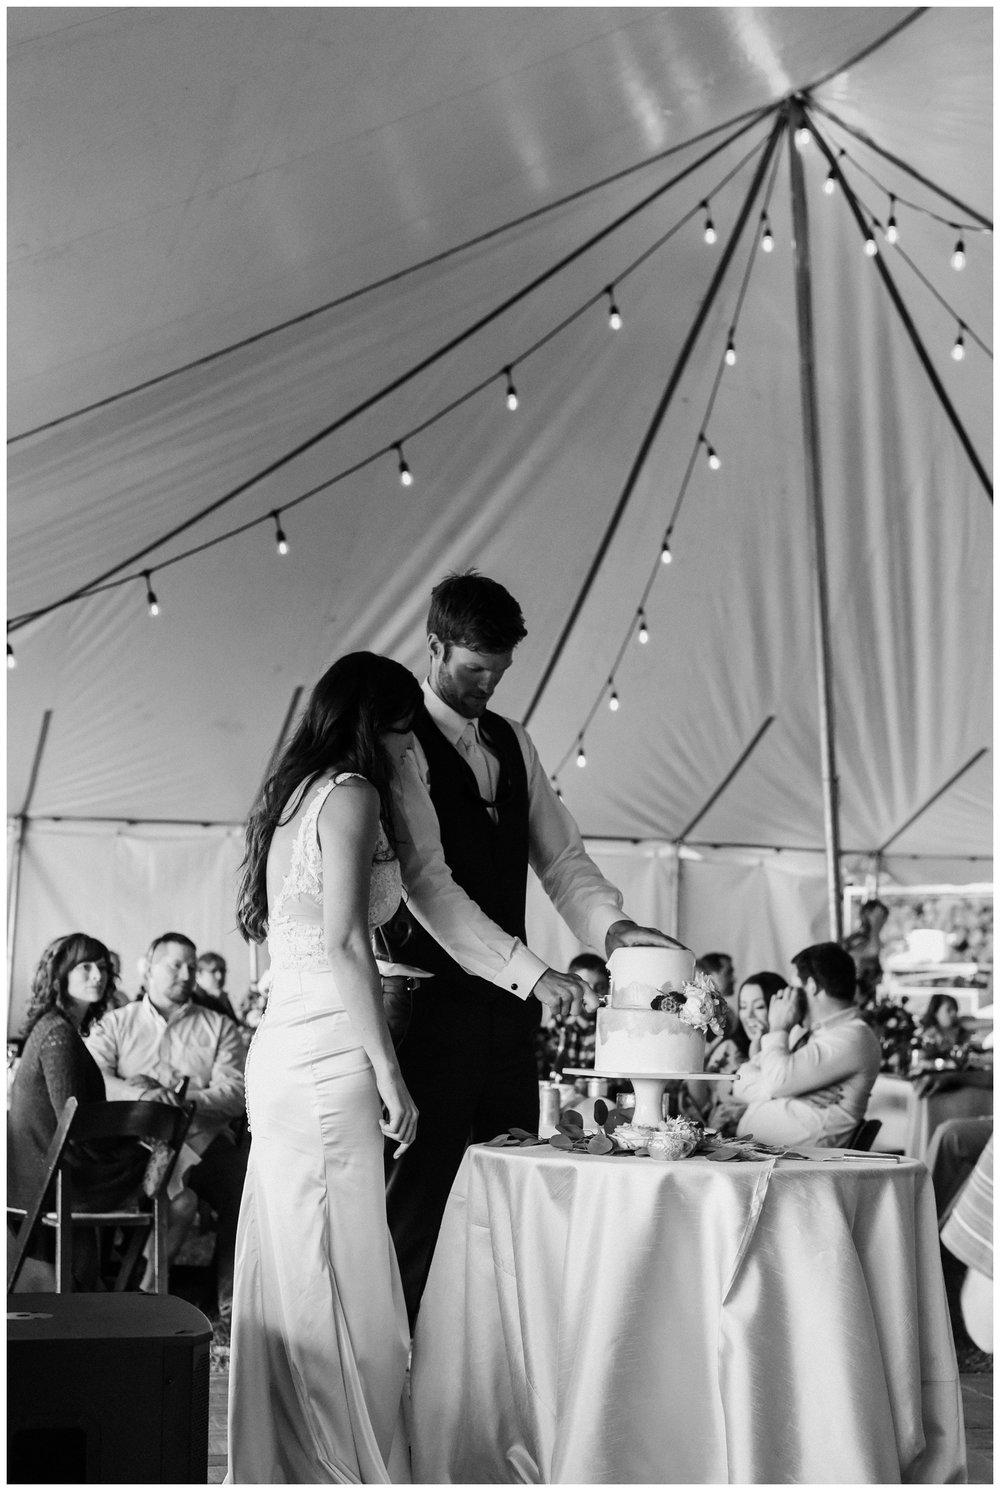 Klamath River Northern California Wedding - Oceana and Kenton - Jessica Heron Images 077.jpg